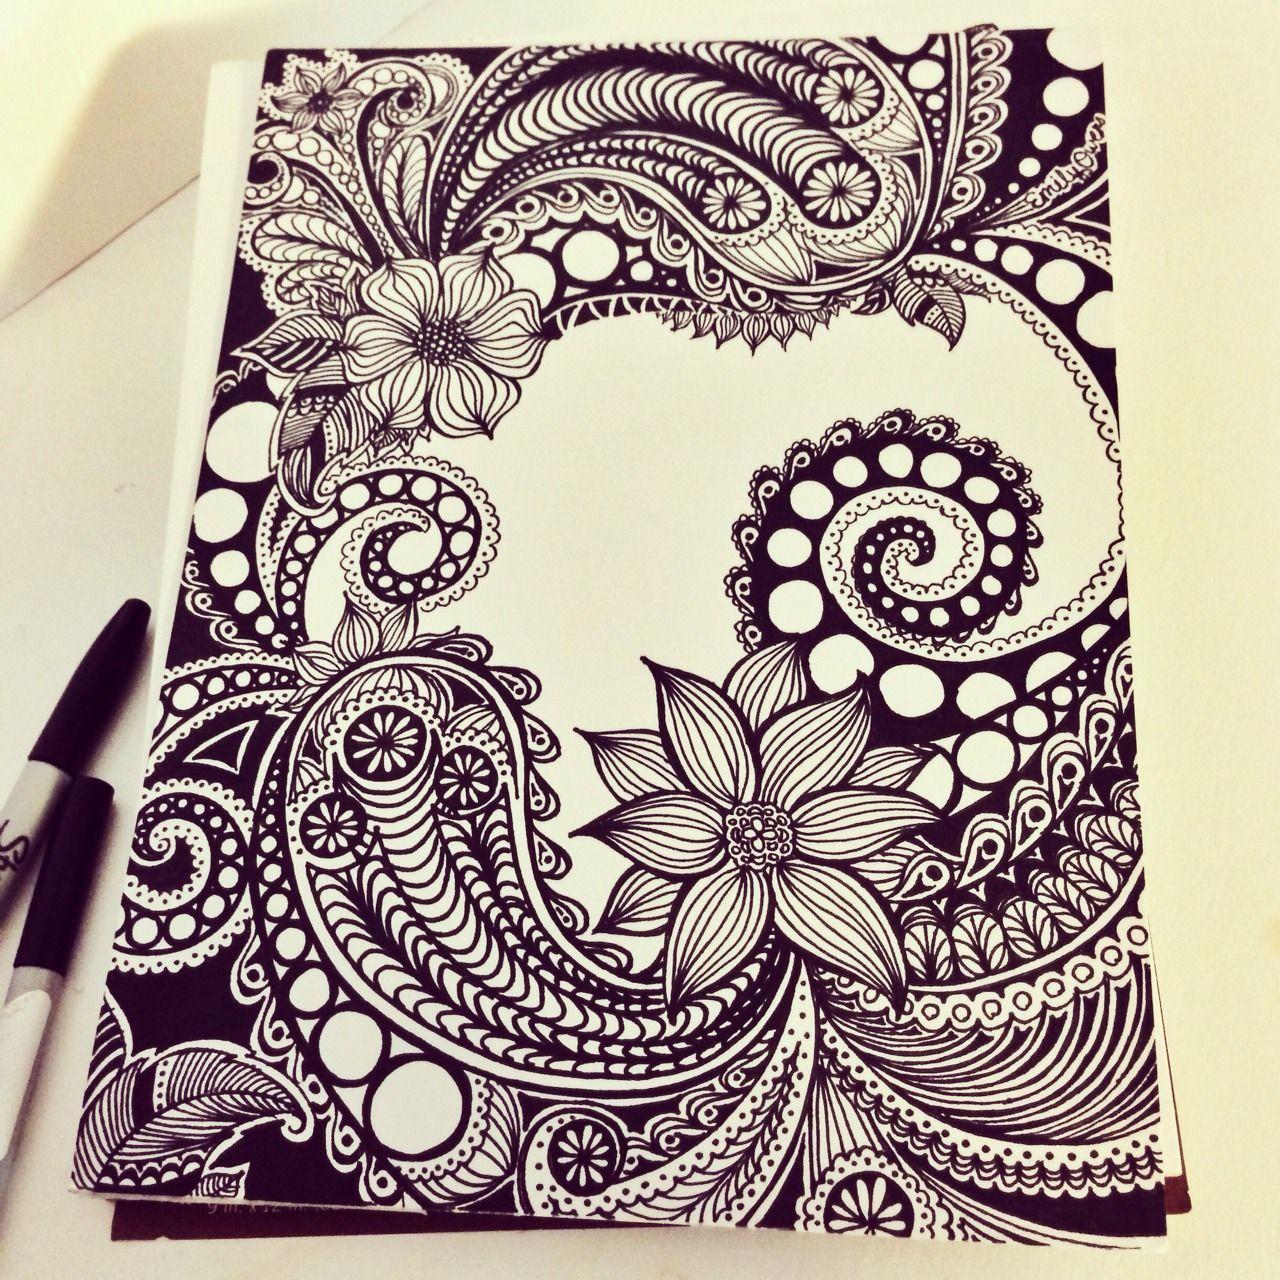 Zen Tangle Art Tumblr Tangle Art Zentangle Art Zentangle